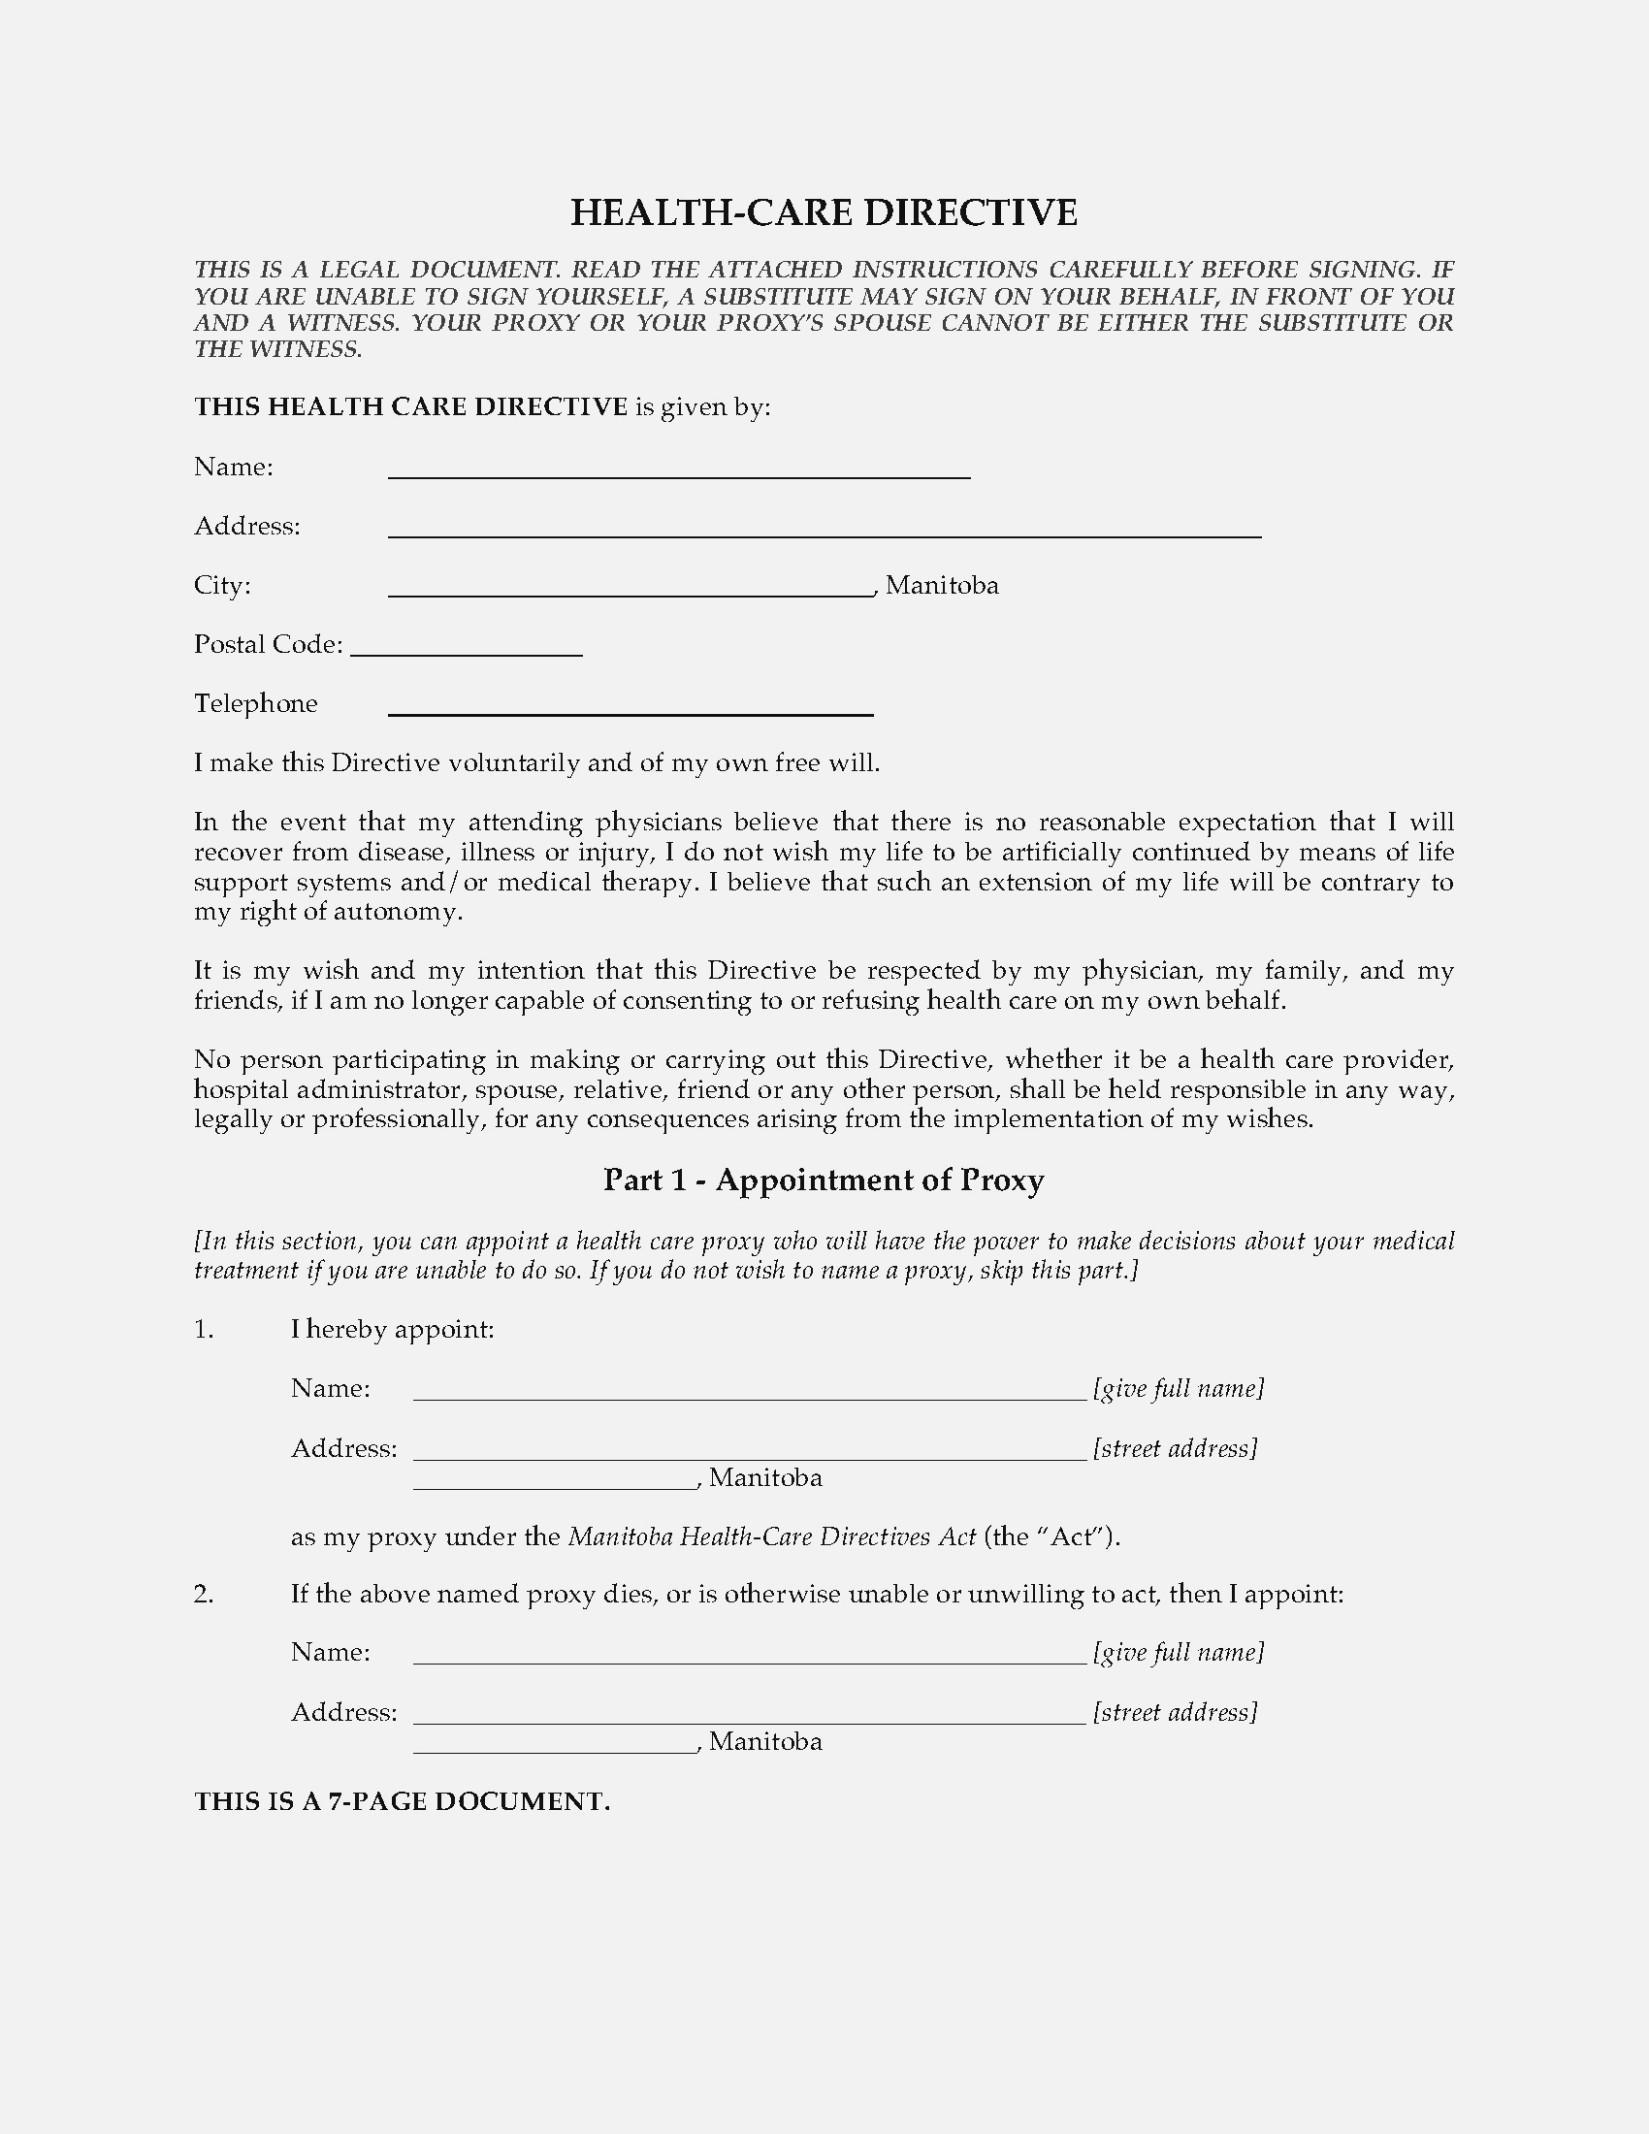 Health Care Directive Form Manitoba